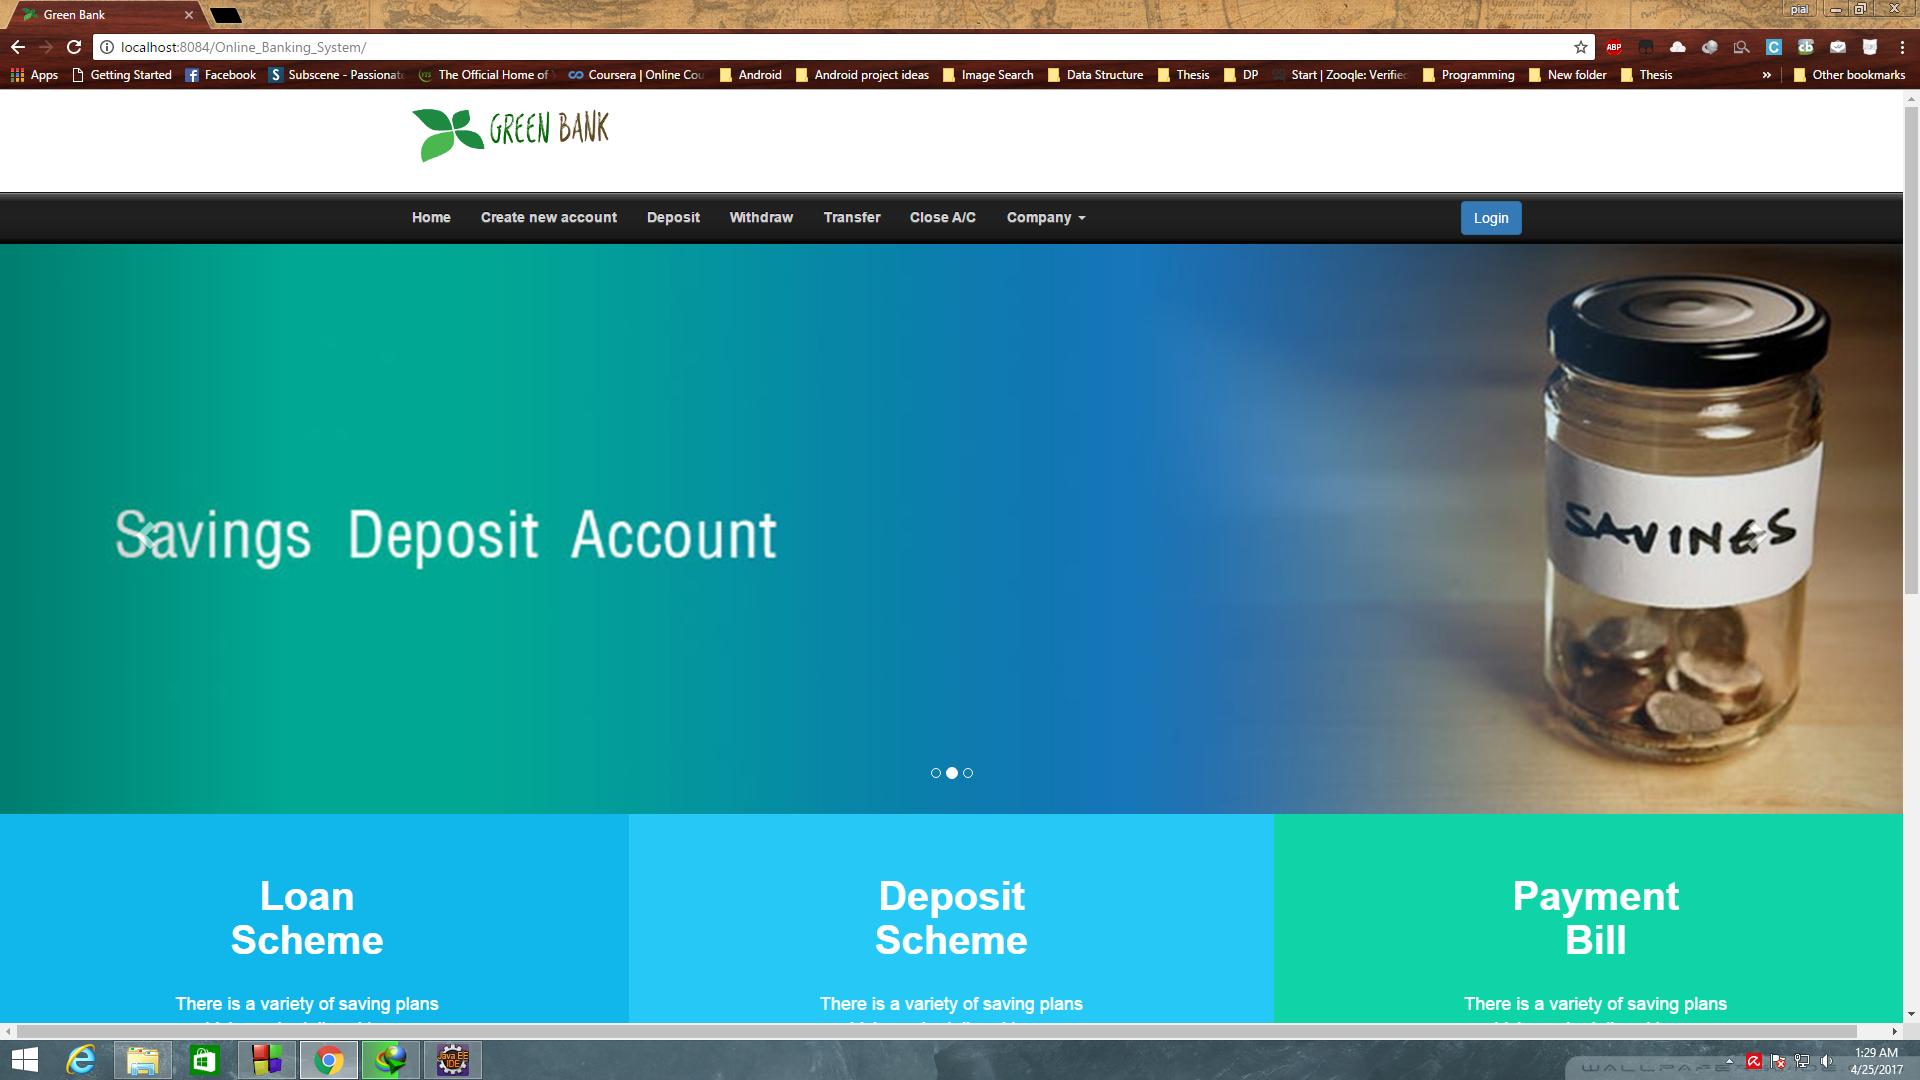 GitHub - PialKanti/Online-Banking-System: Java, J2EE based website